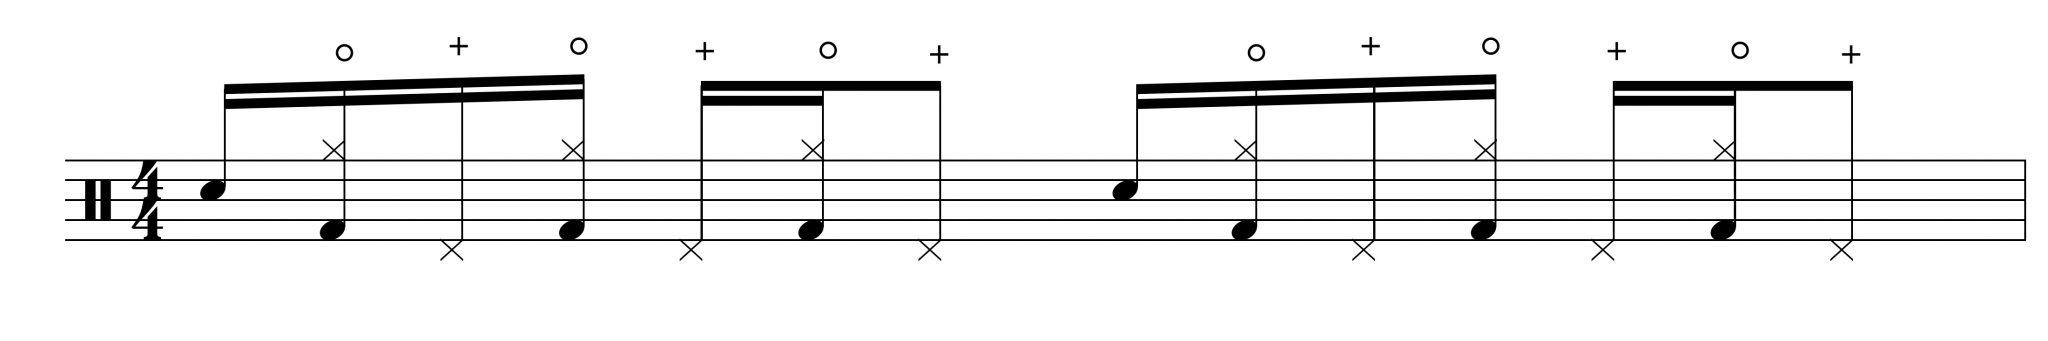 Drum Lessons Singapore Rhythm House Music